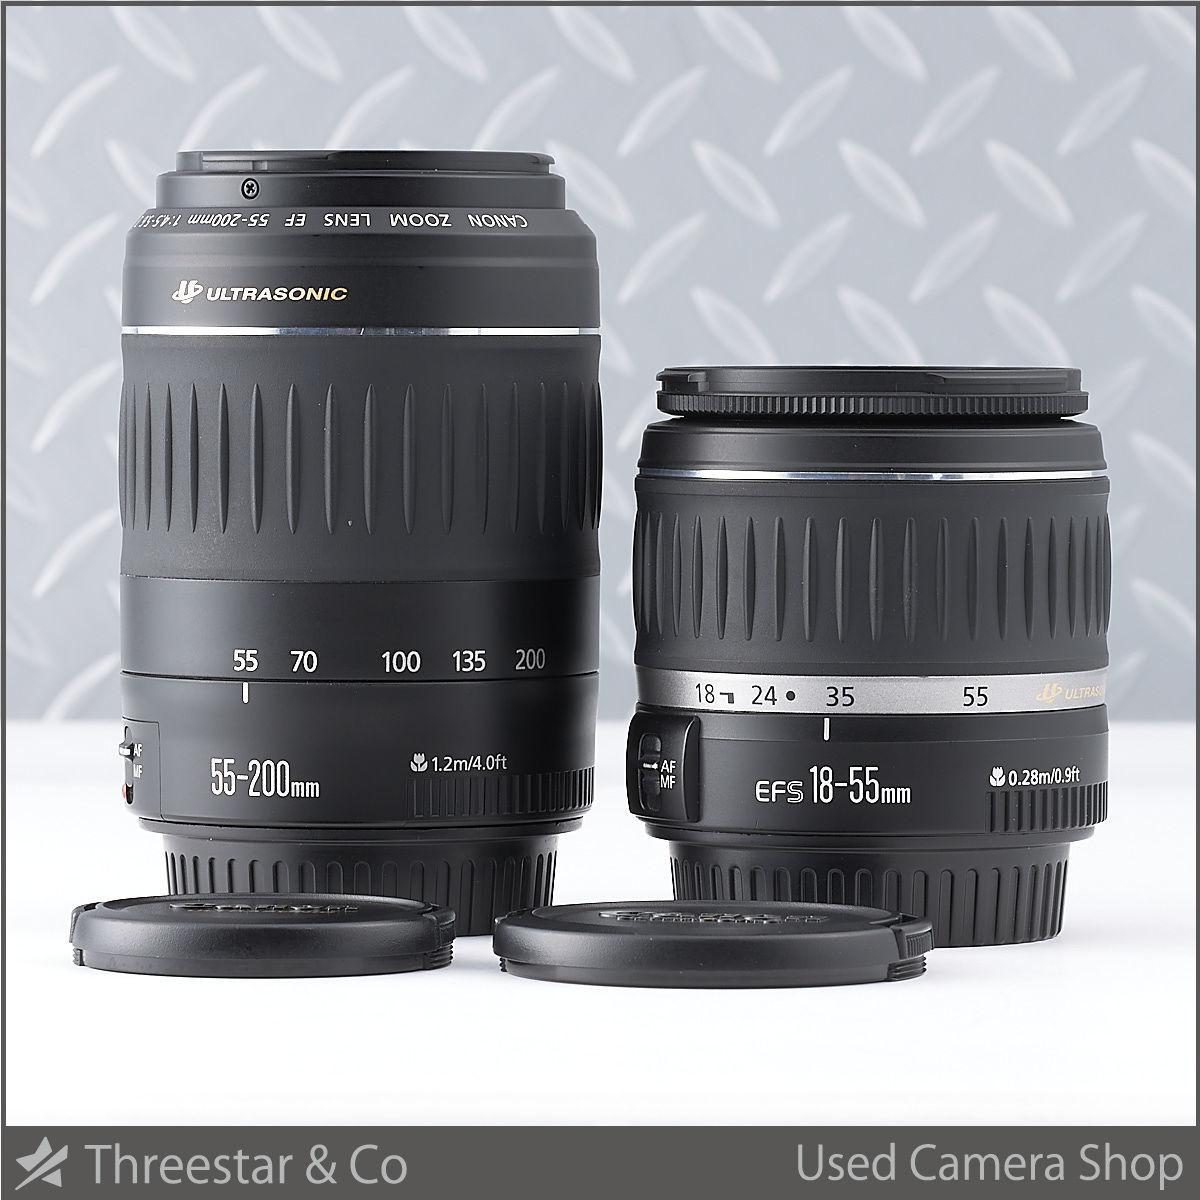 1円~ CANON EF-S 18-55mm F3.5-5.6 II USM/EF 55-200mm F4.5-5.6 II USM セット 【3】